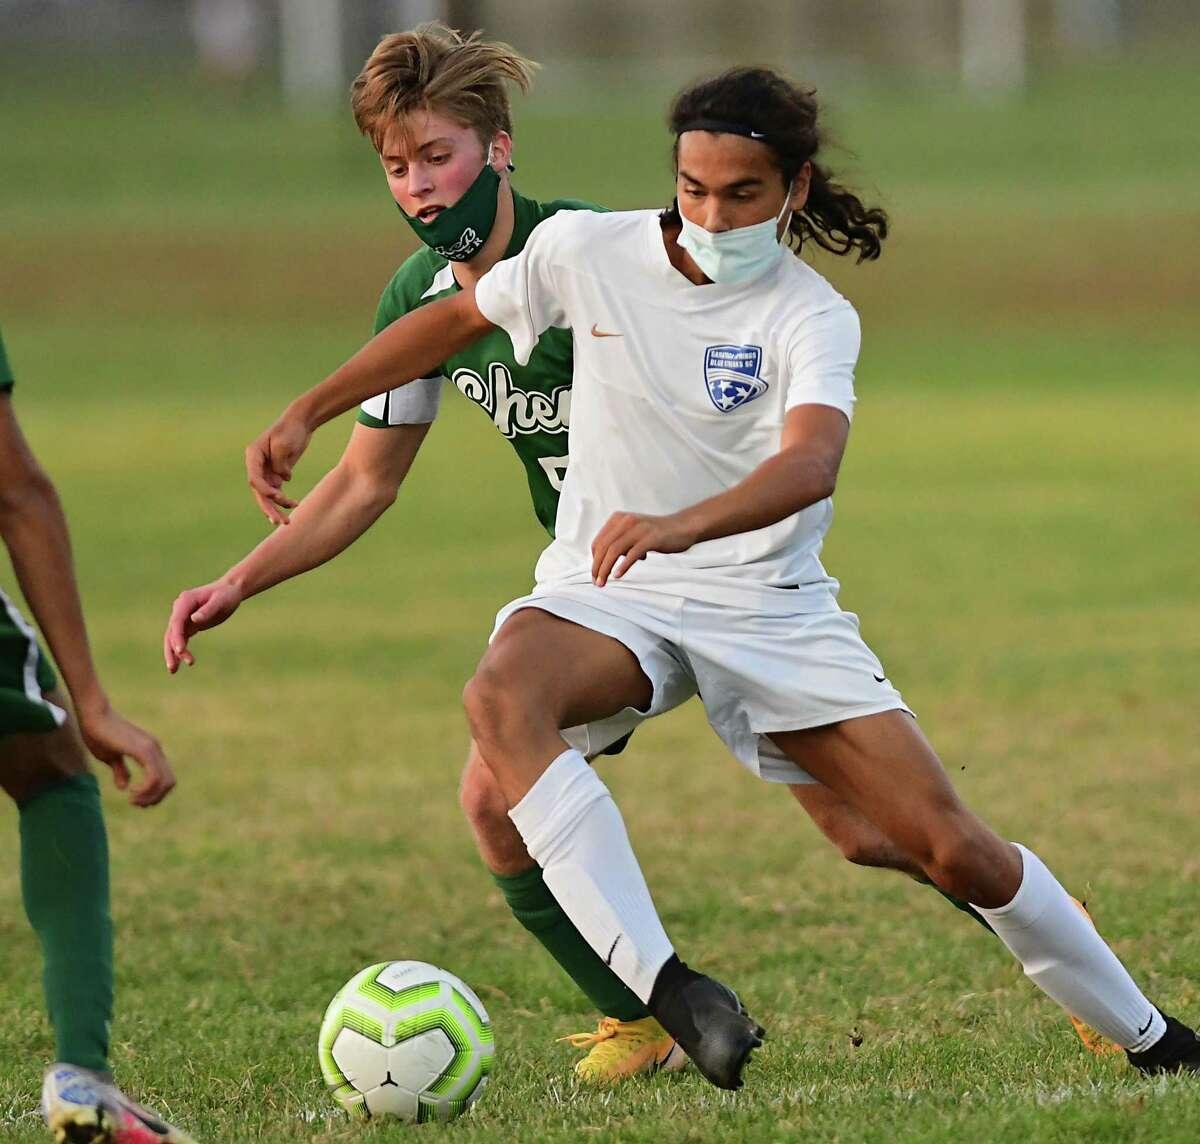 Shenendehowa's Owen Brignati, left, battles with Saratoga's Nicholas Varghese during a soccer game on Friday, Nov. 6, 2020 in Clifton Park, N.Y. (Lori Van Buren/Times Union)